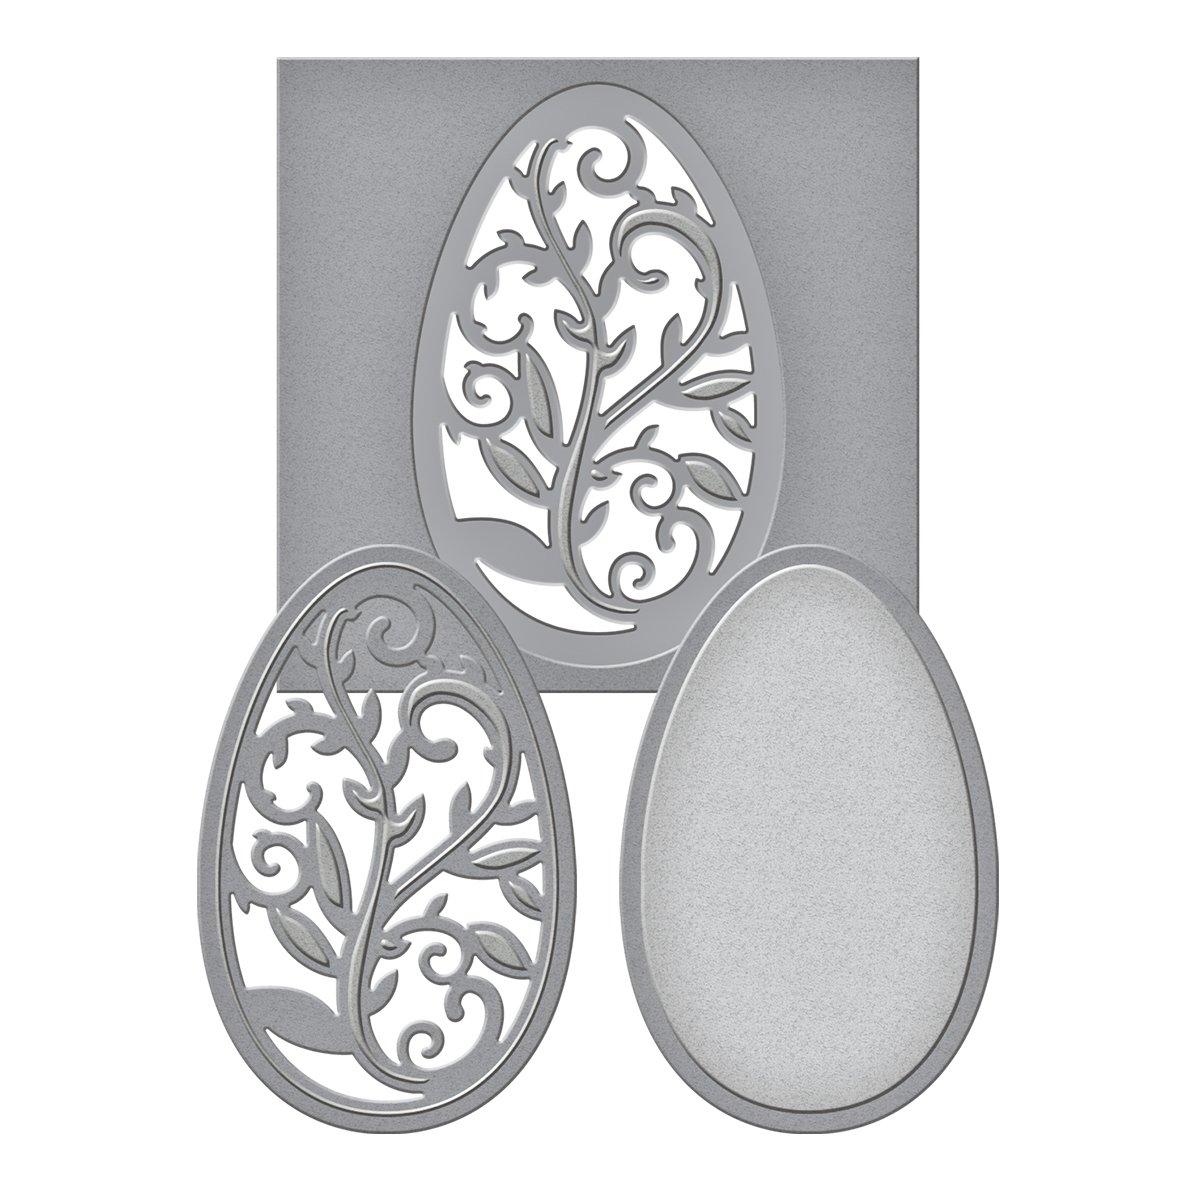 Amazon.com: Spellbinders S2-053 Die D-Lites Filigree Egg Etched ...